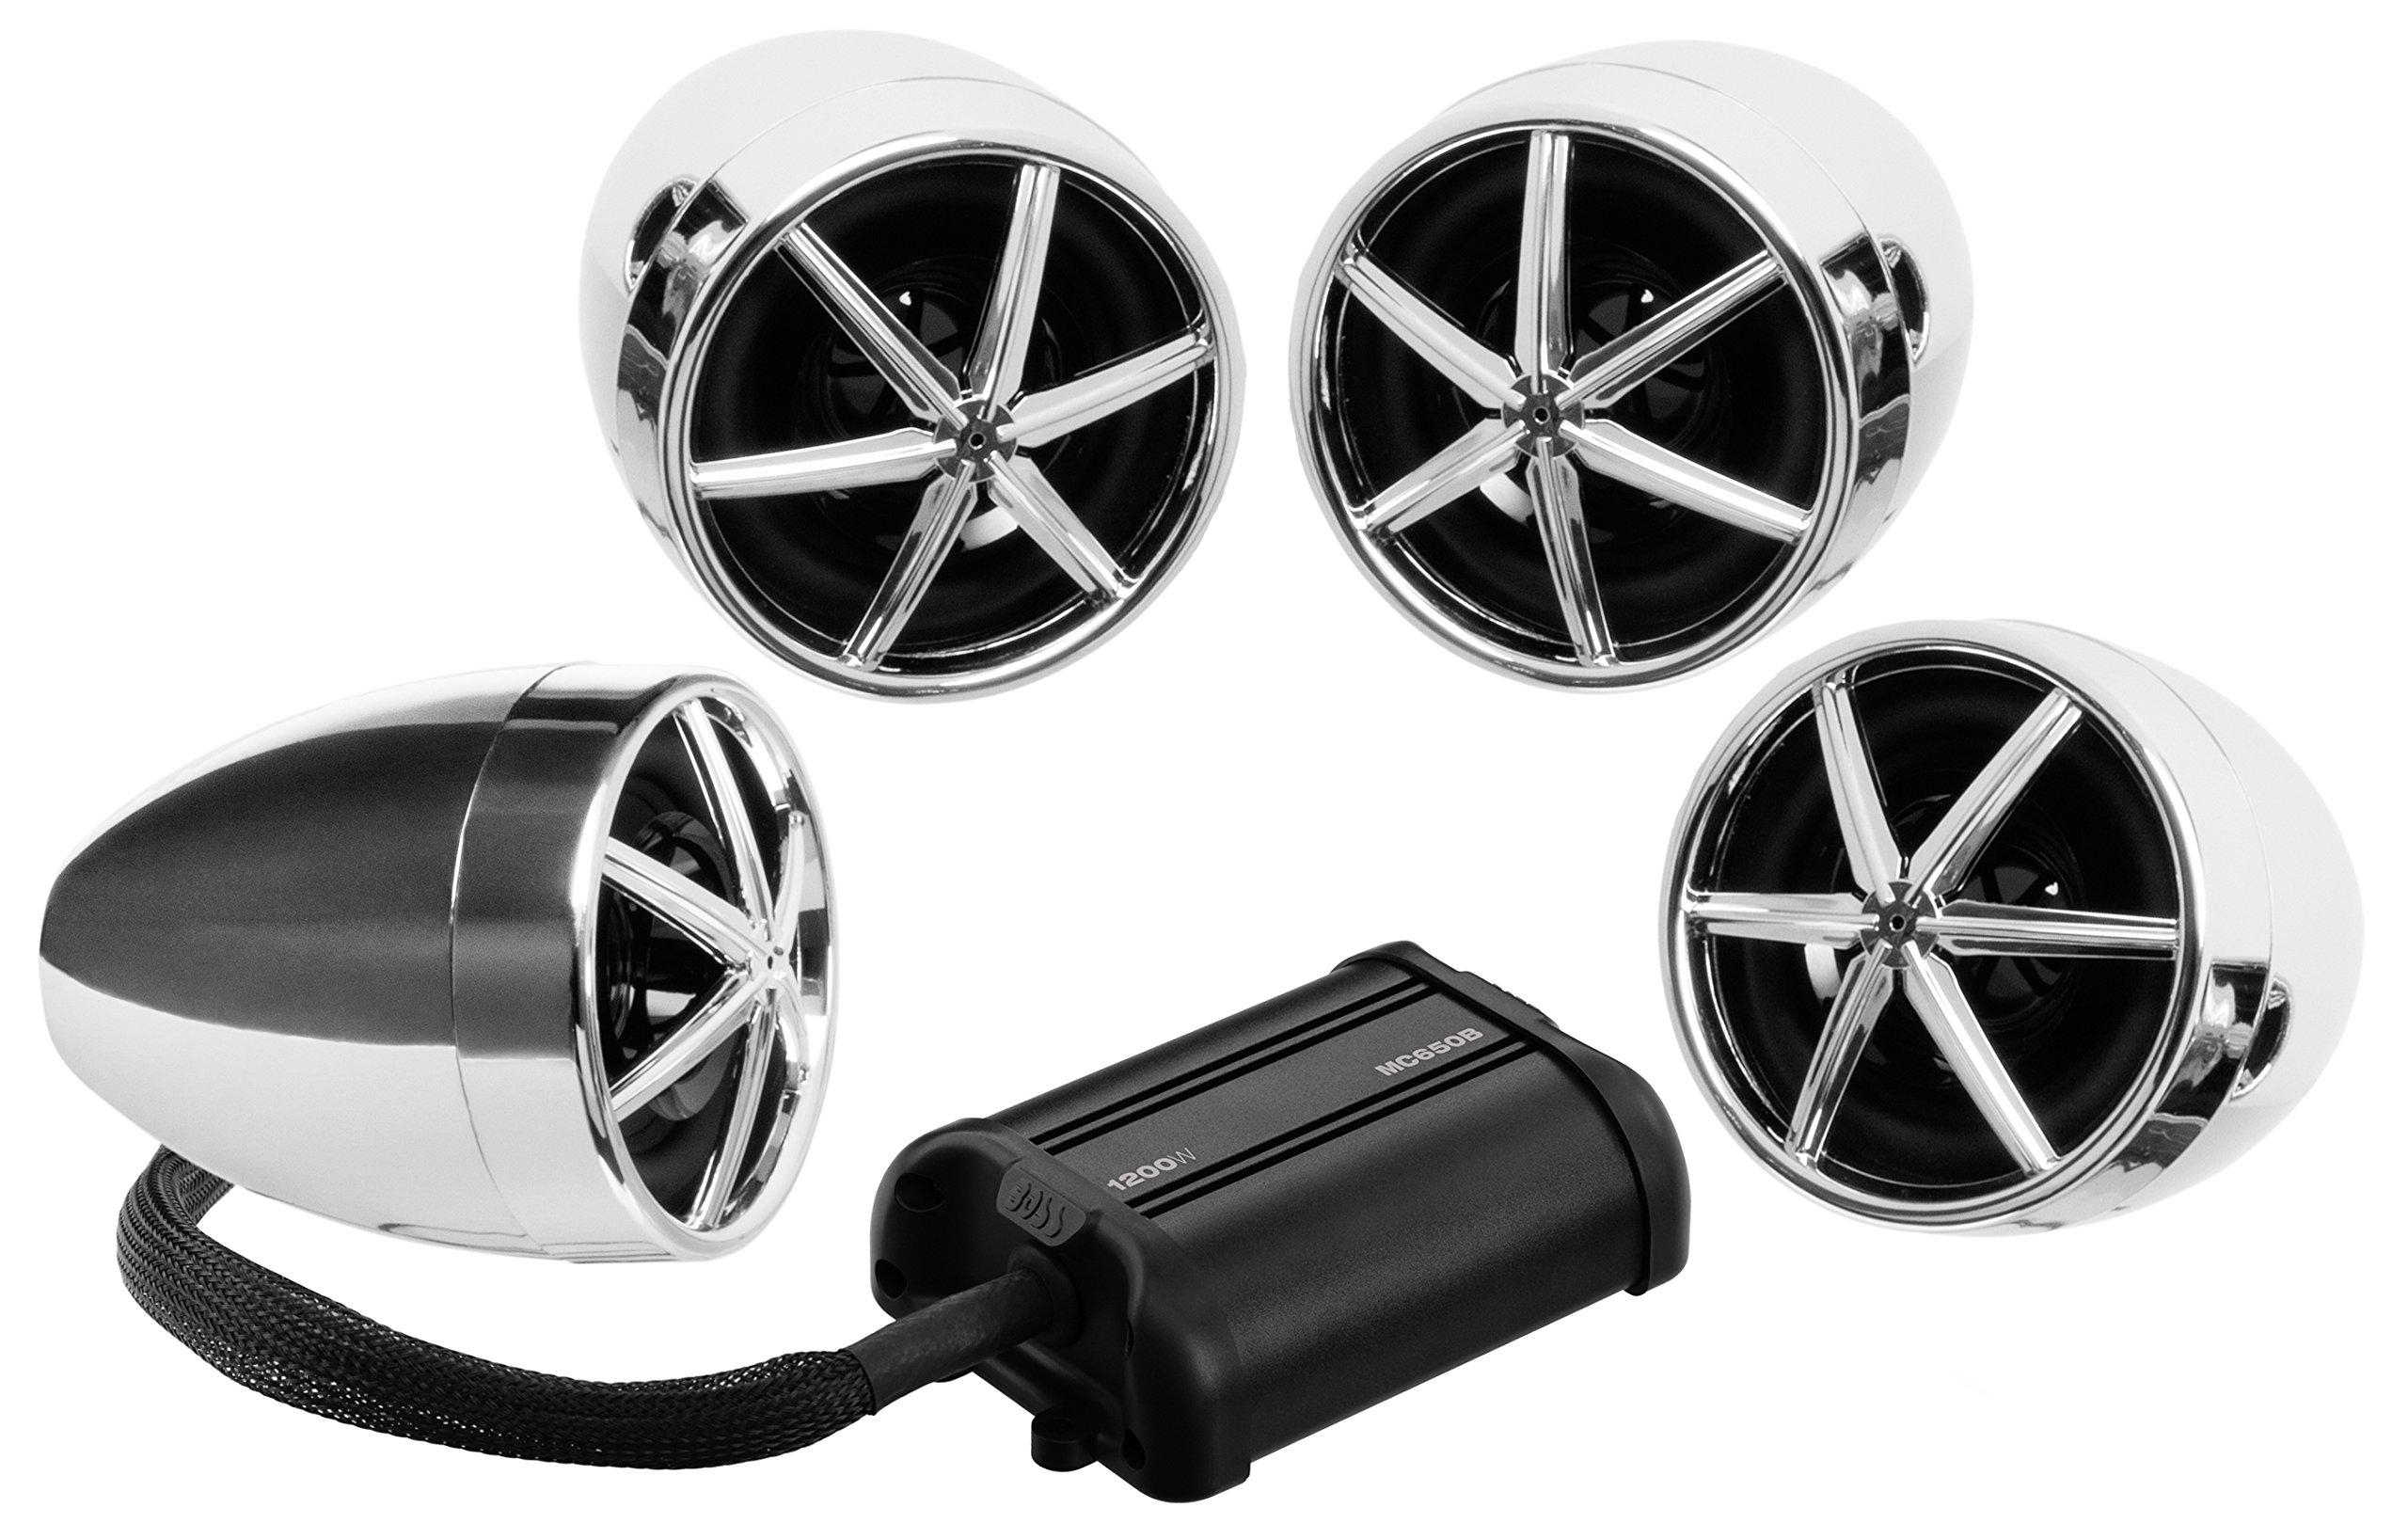 Boss MC650B 1200w Bluetooth (4) Speaker+Amplifier Handlebar System Motorcycle/ATV